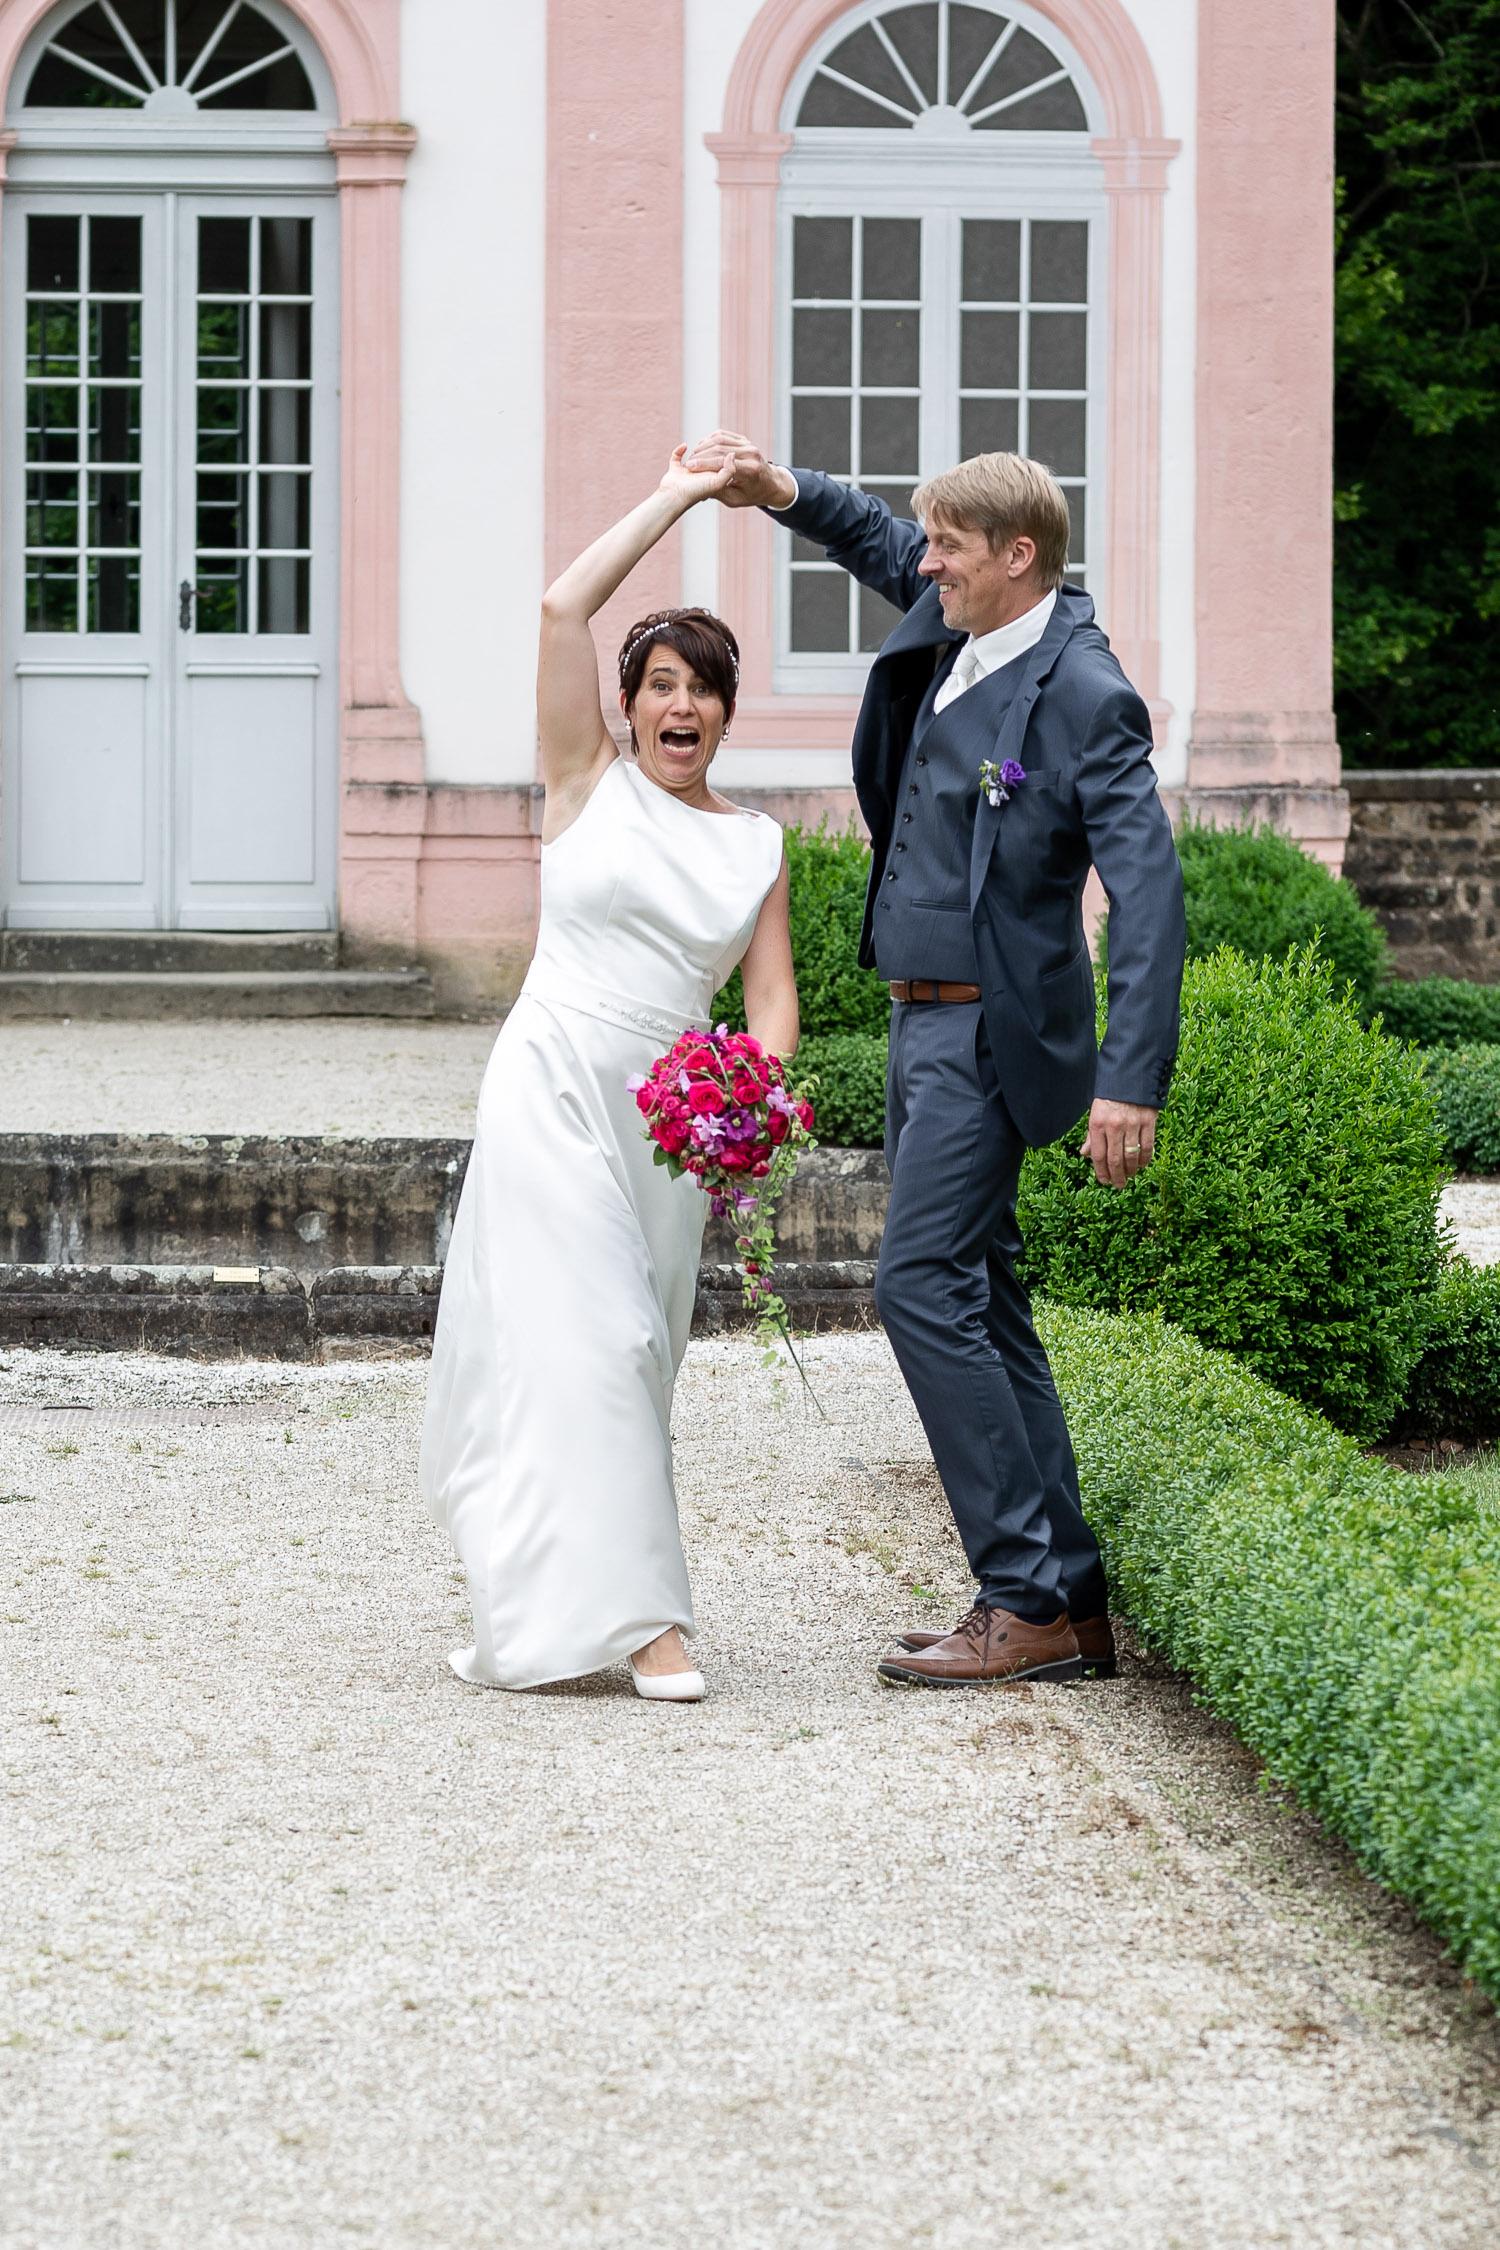 dancing wedding couple in the garden of Schloss Weilerbach, Wedding, Hochzeit, Andrea Schenke Photography